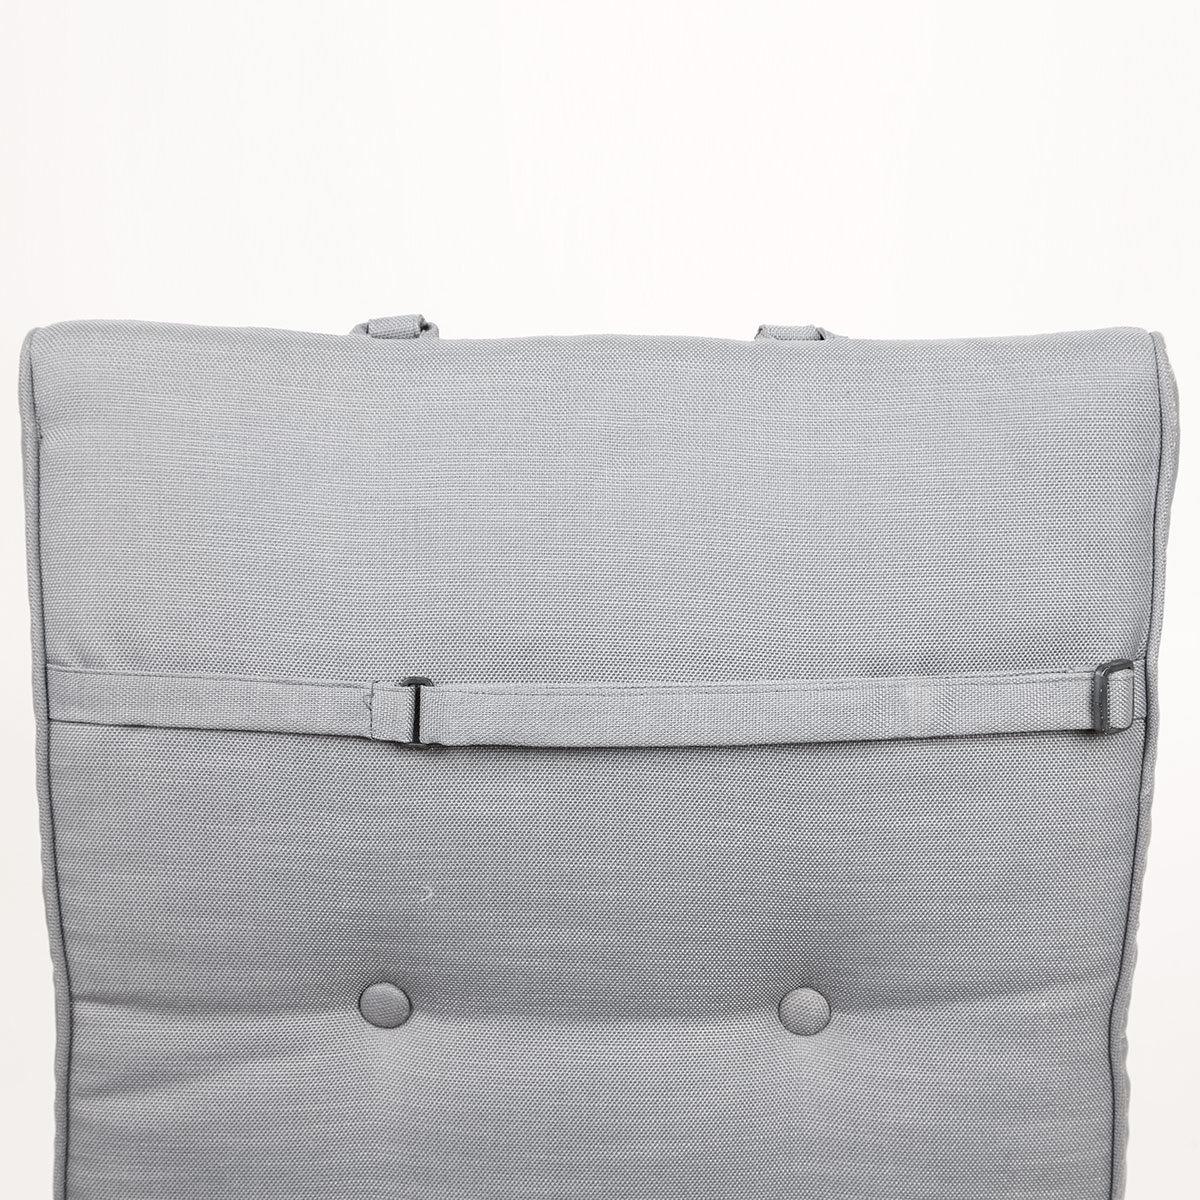 Hochlehnerauflage, grau | #2